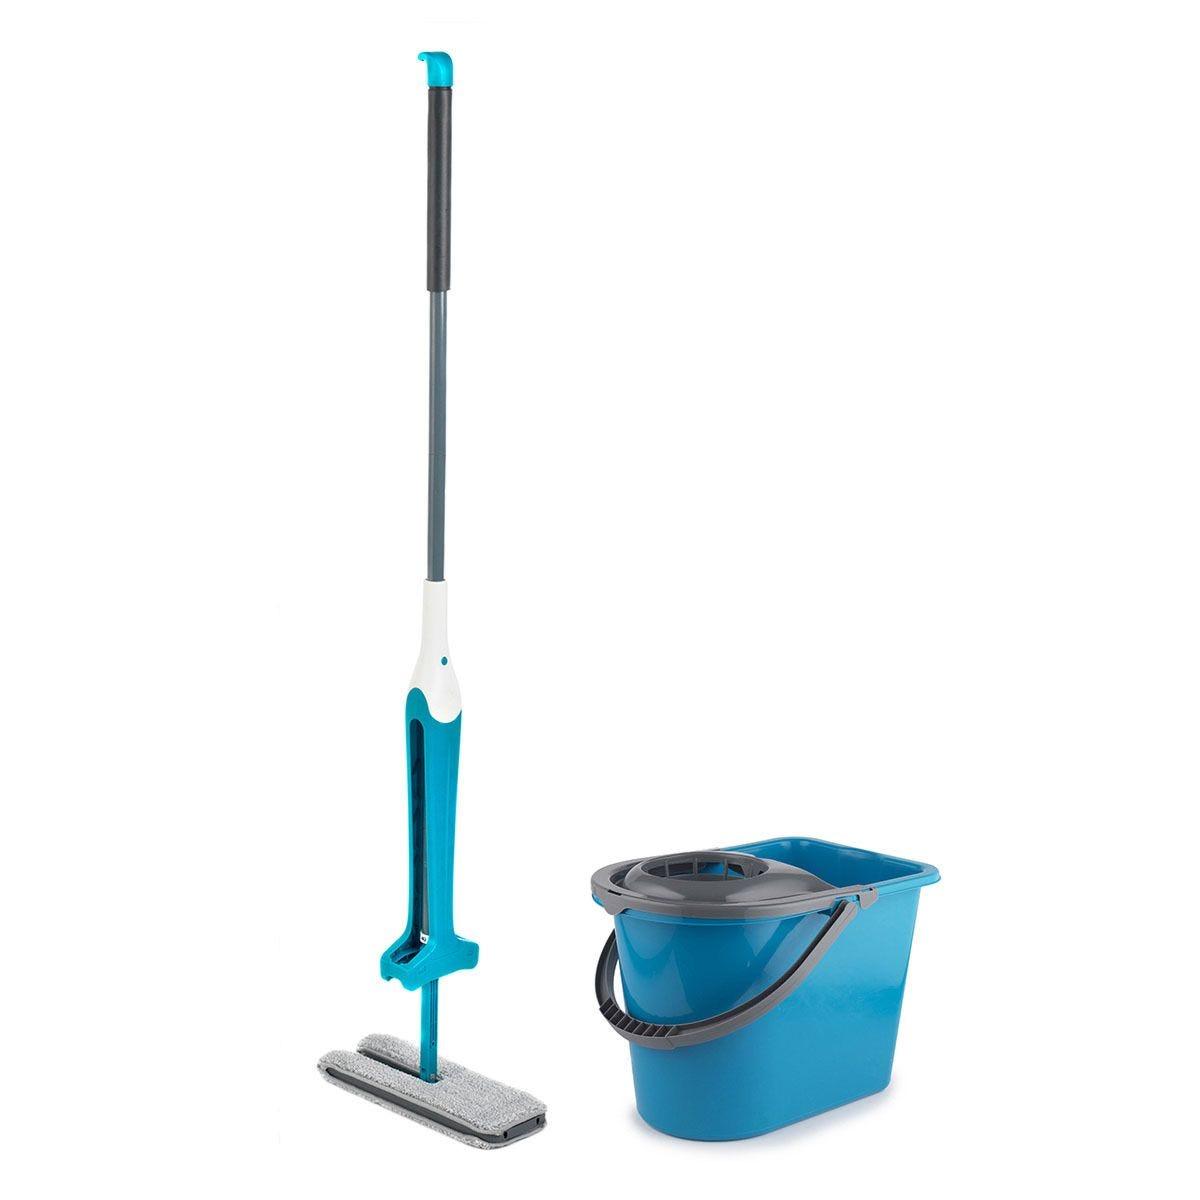 Beldray Squeegee Mop and Bucket Set